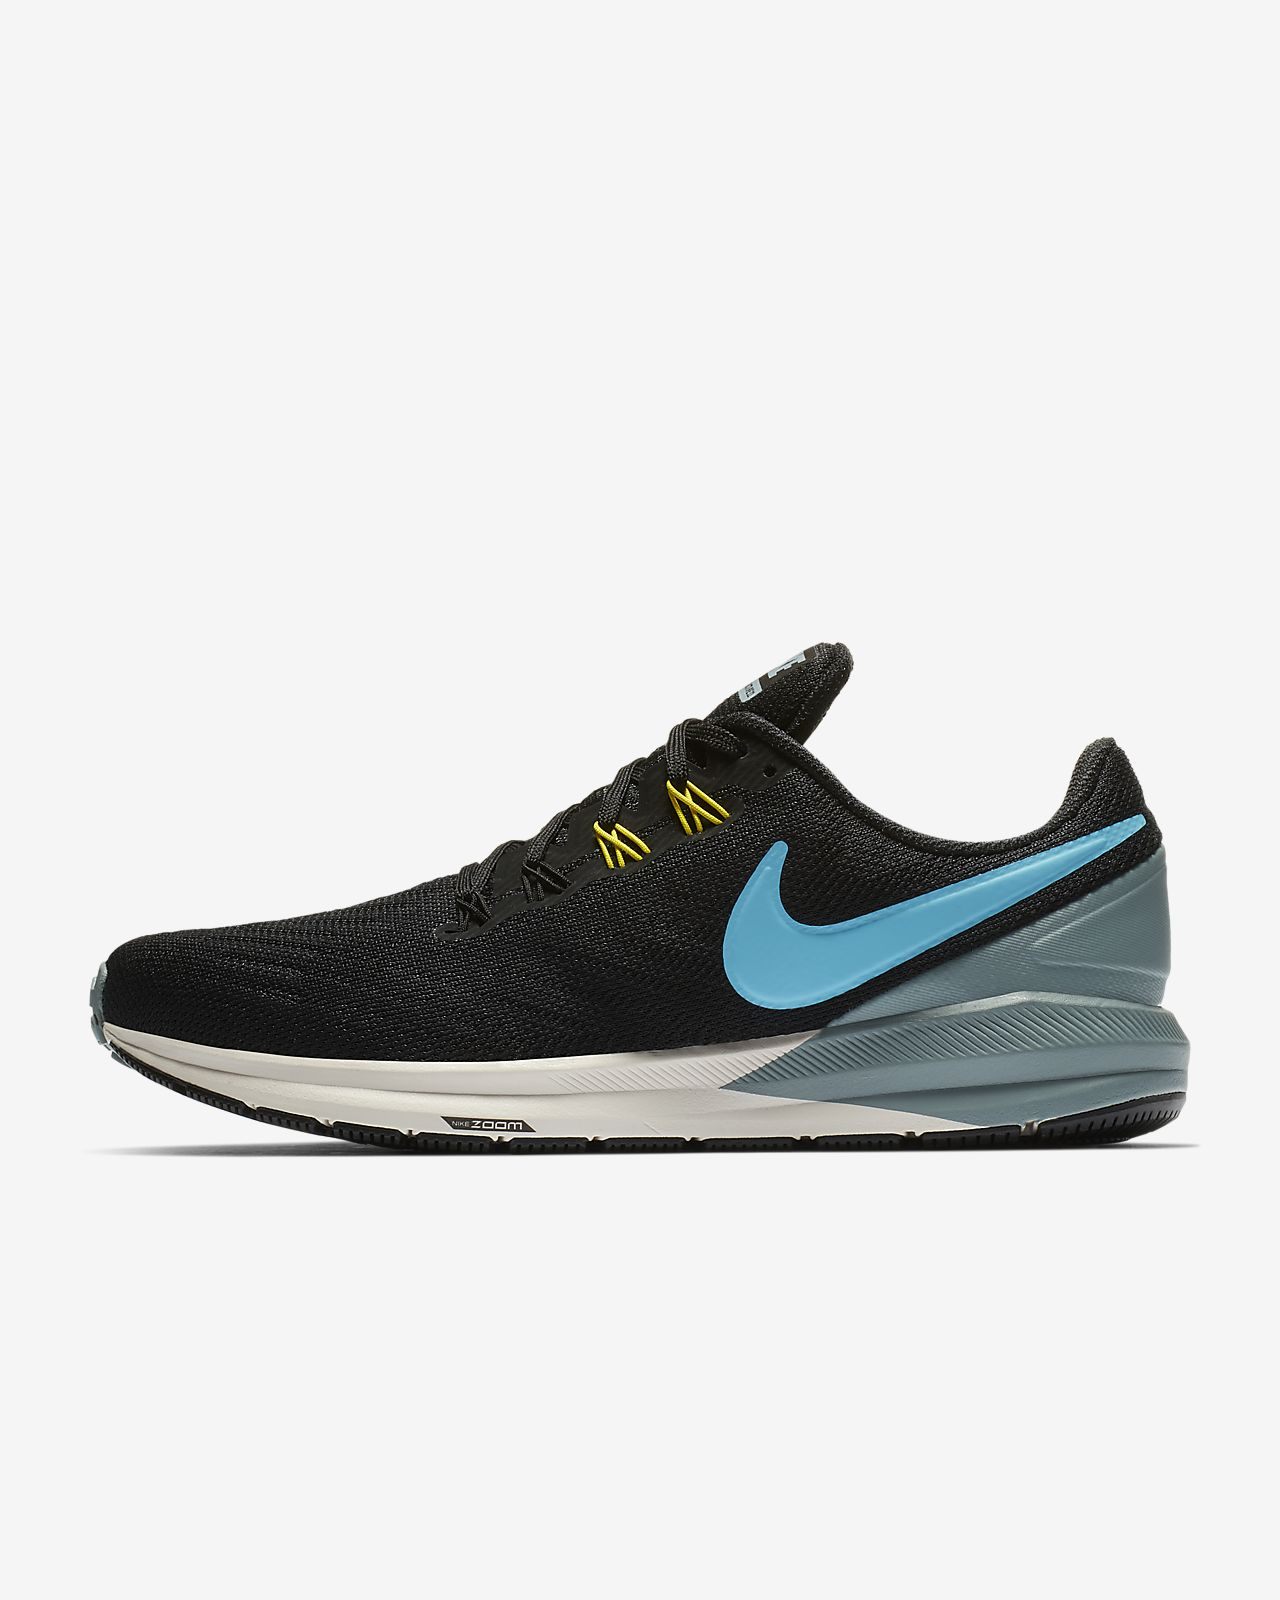 Nike Air Zoom Structure 22 男子跑步鞋